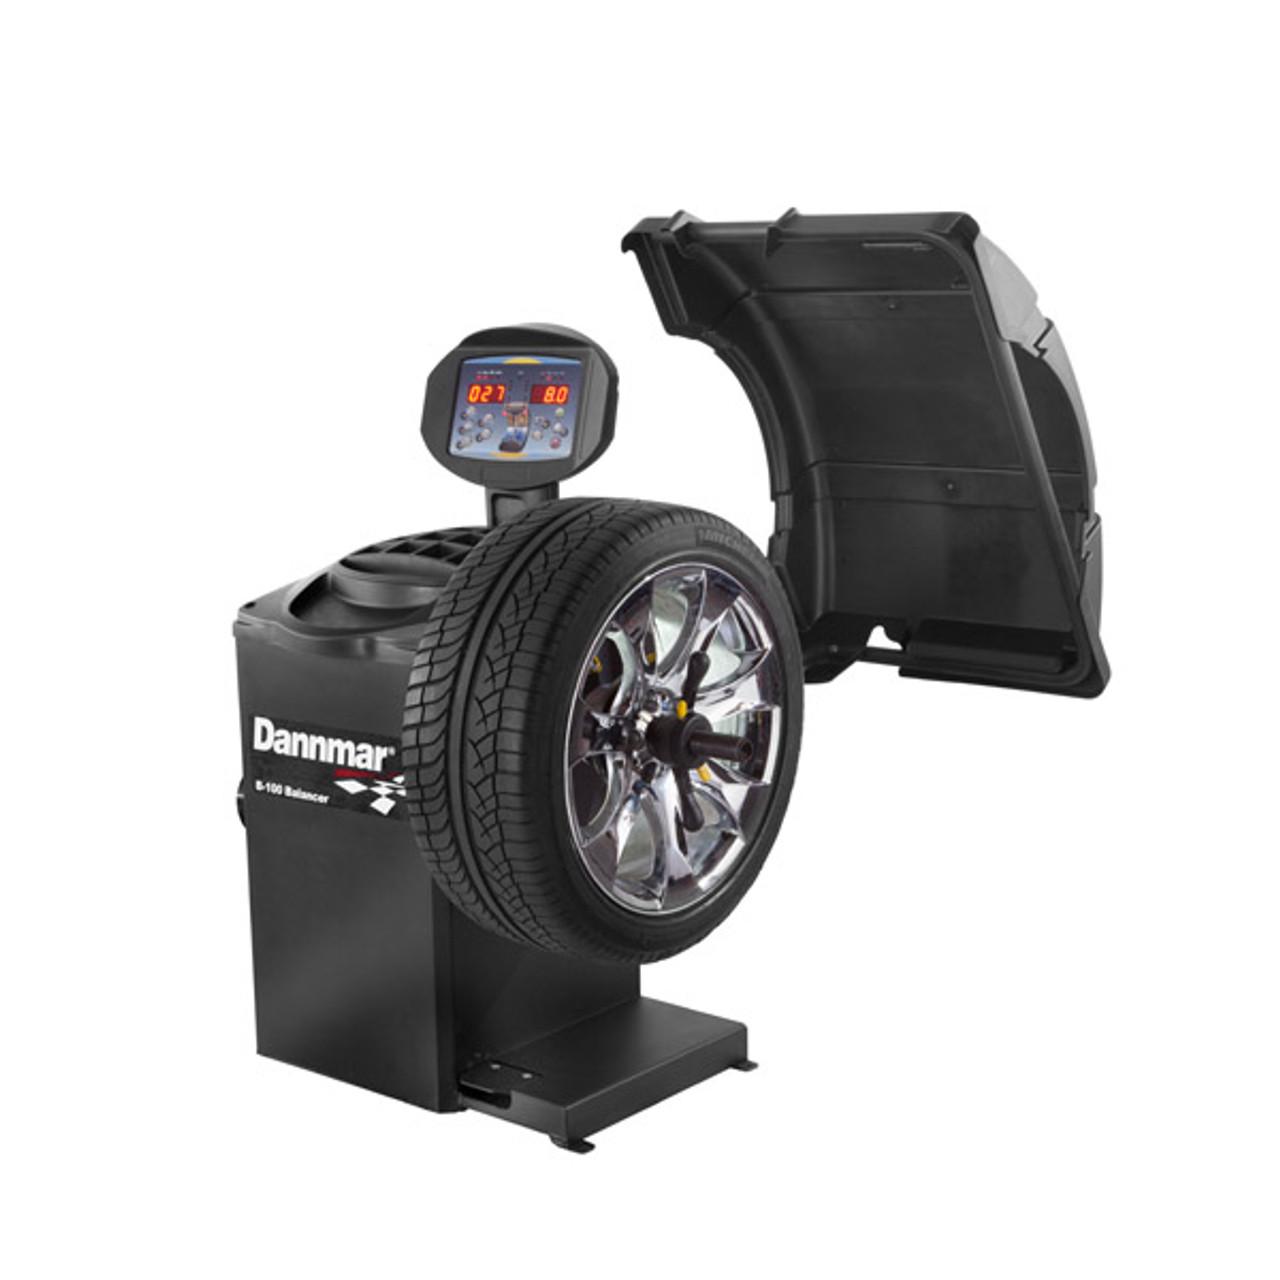 DANNMAR  B-100 - Item #1381201 Wheel Balancer